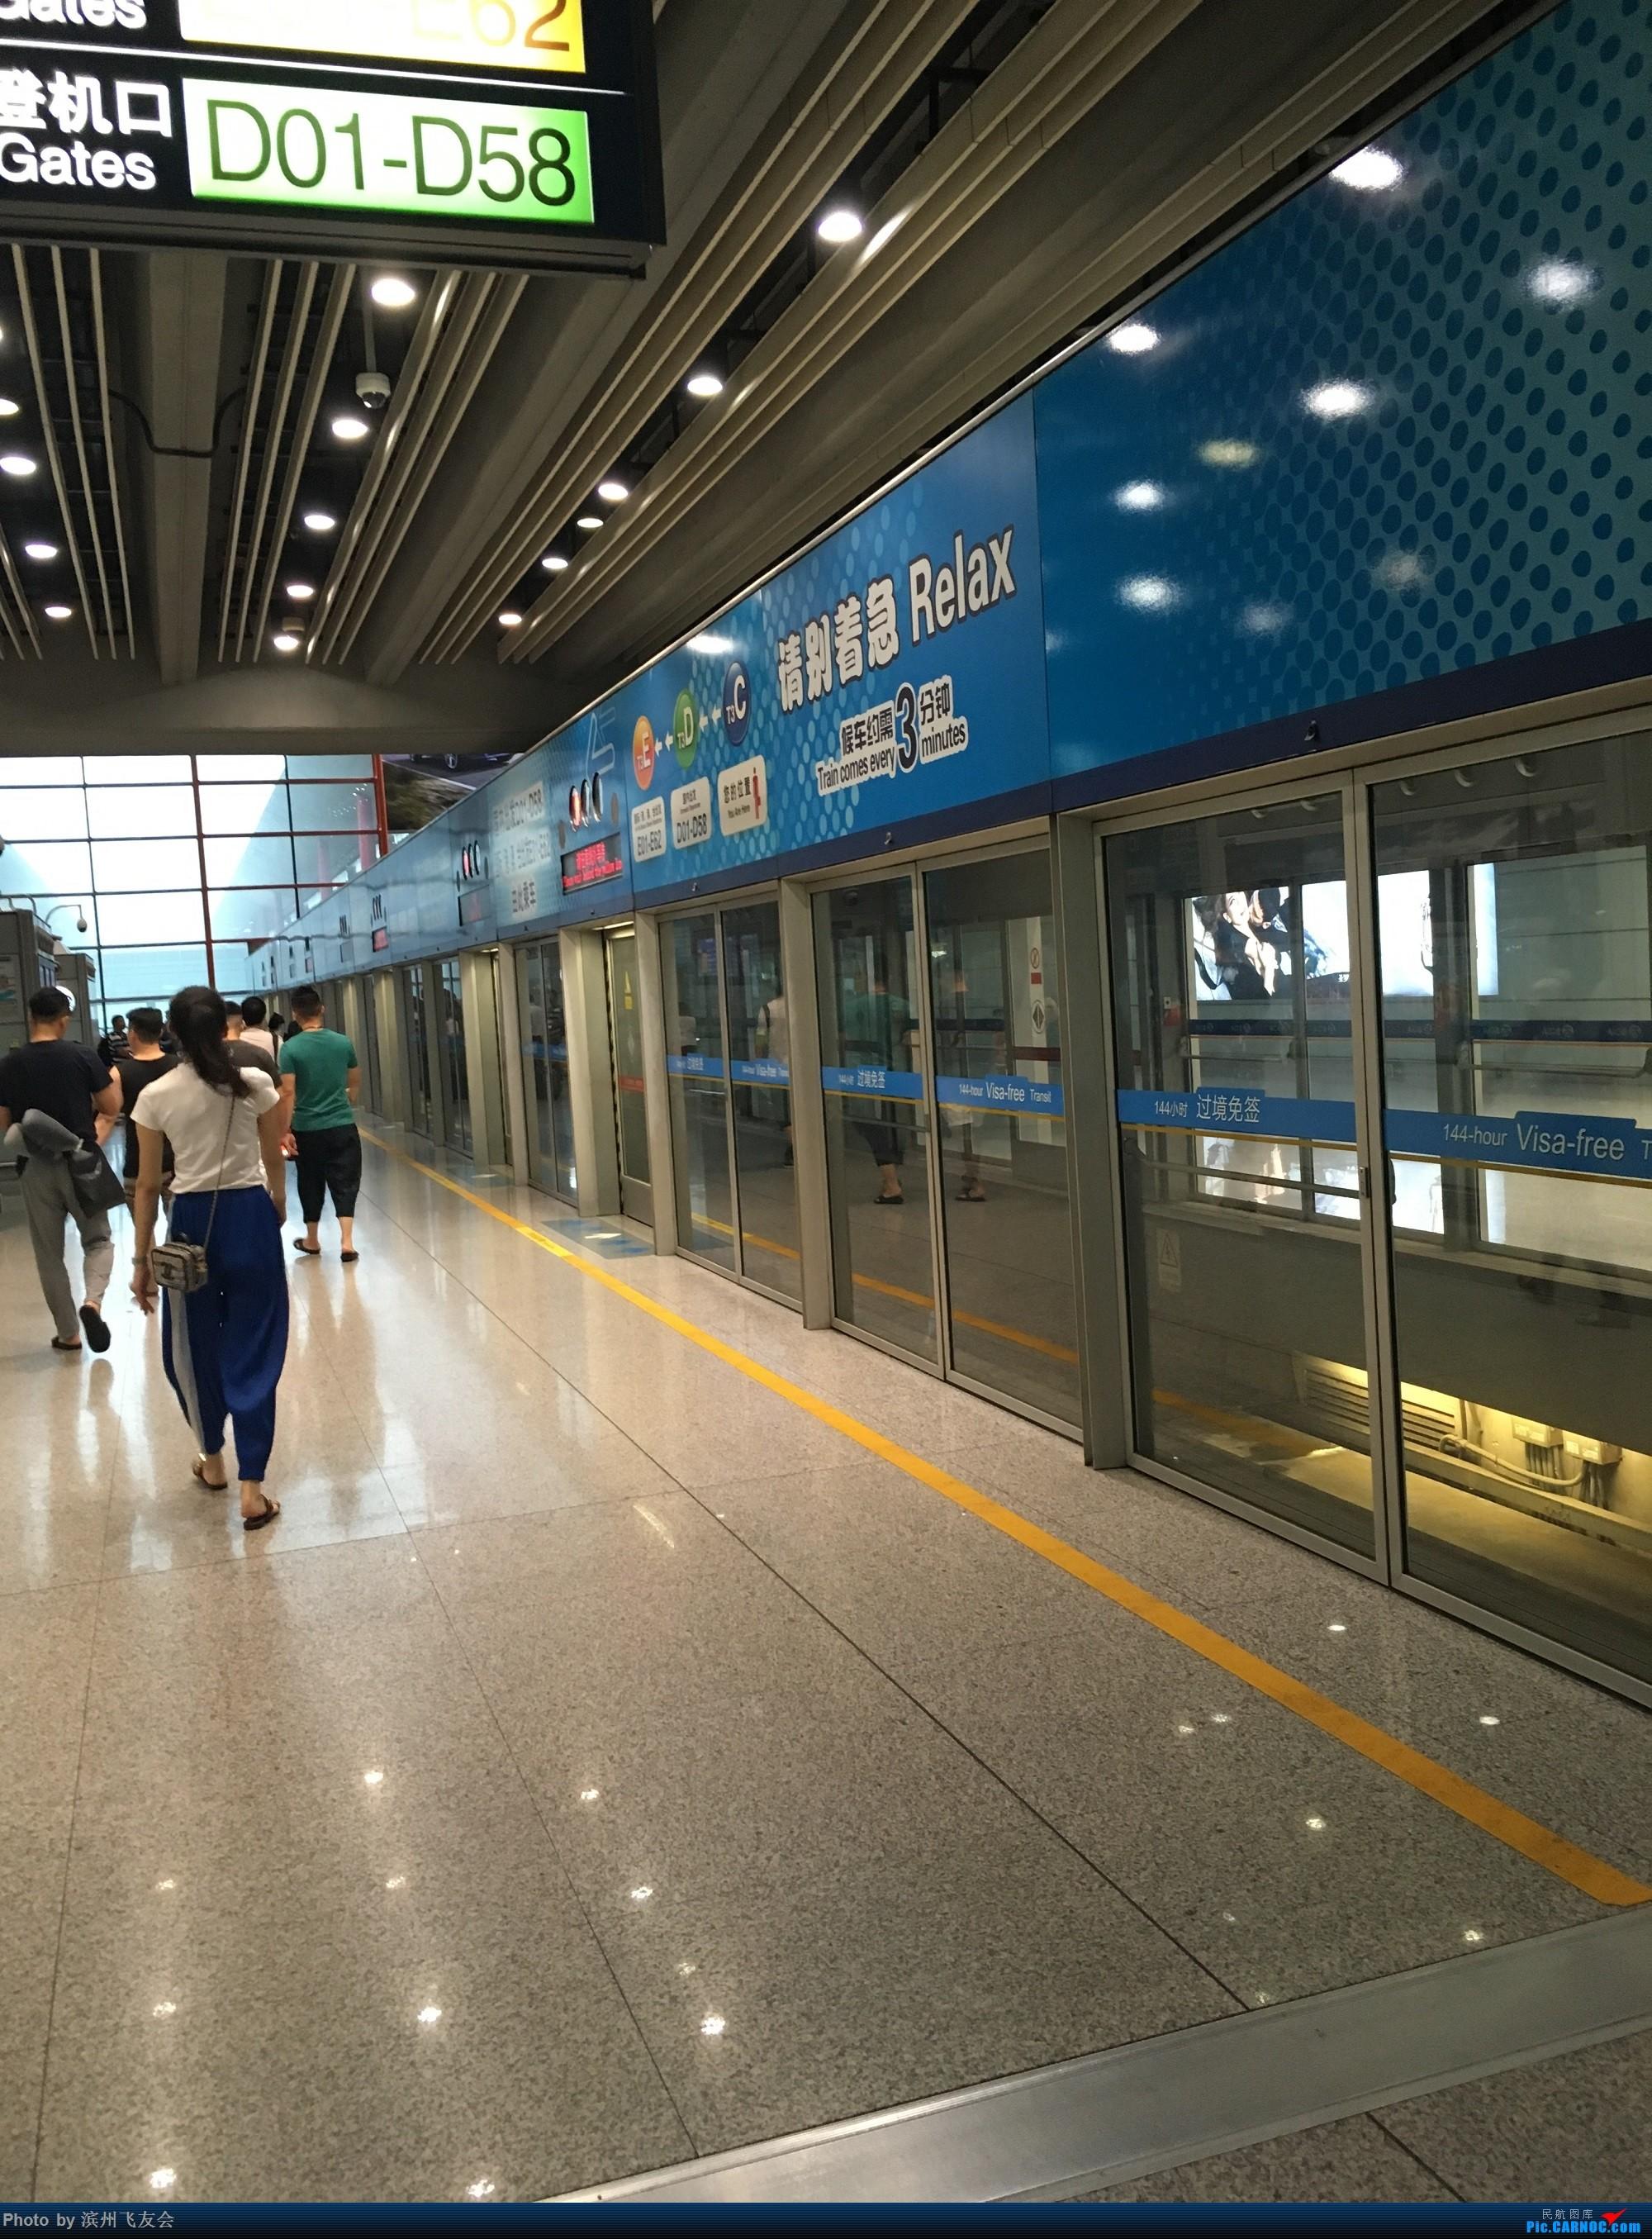 Re:[原创]~骚年飞行篇~补充半年前的香港之路,国航CA111 PEK-HKG,有幸坐到大擦第50架77W    中国北京首都国际机场